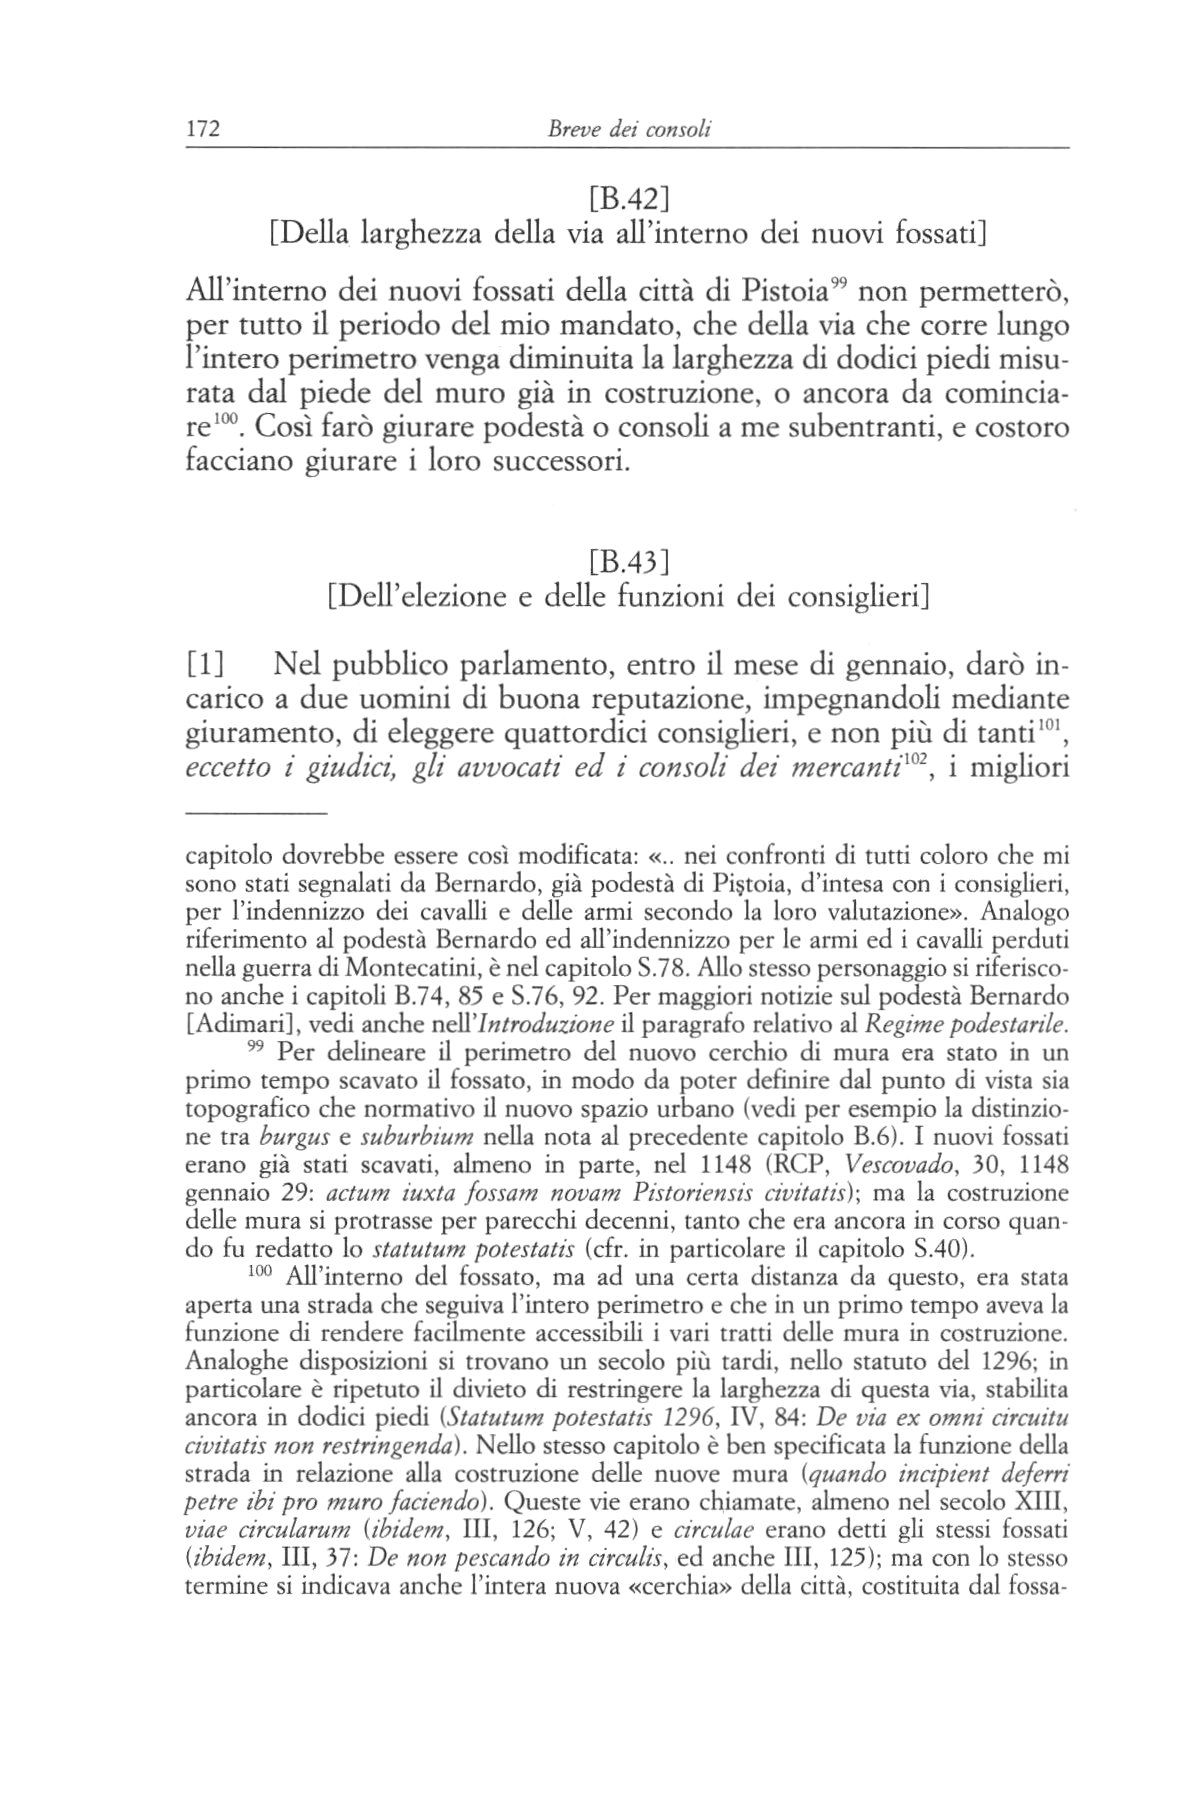 statuti pistoiesi del sec.XII 0172.jpg